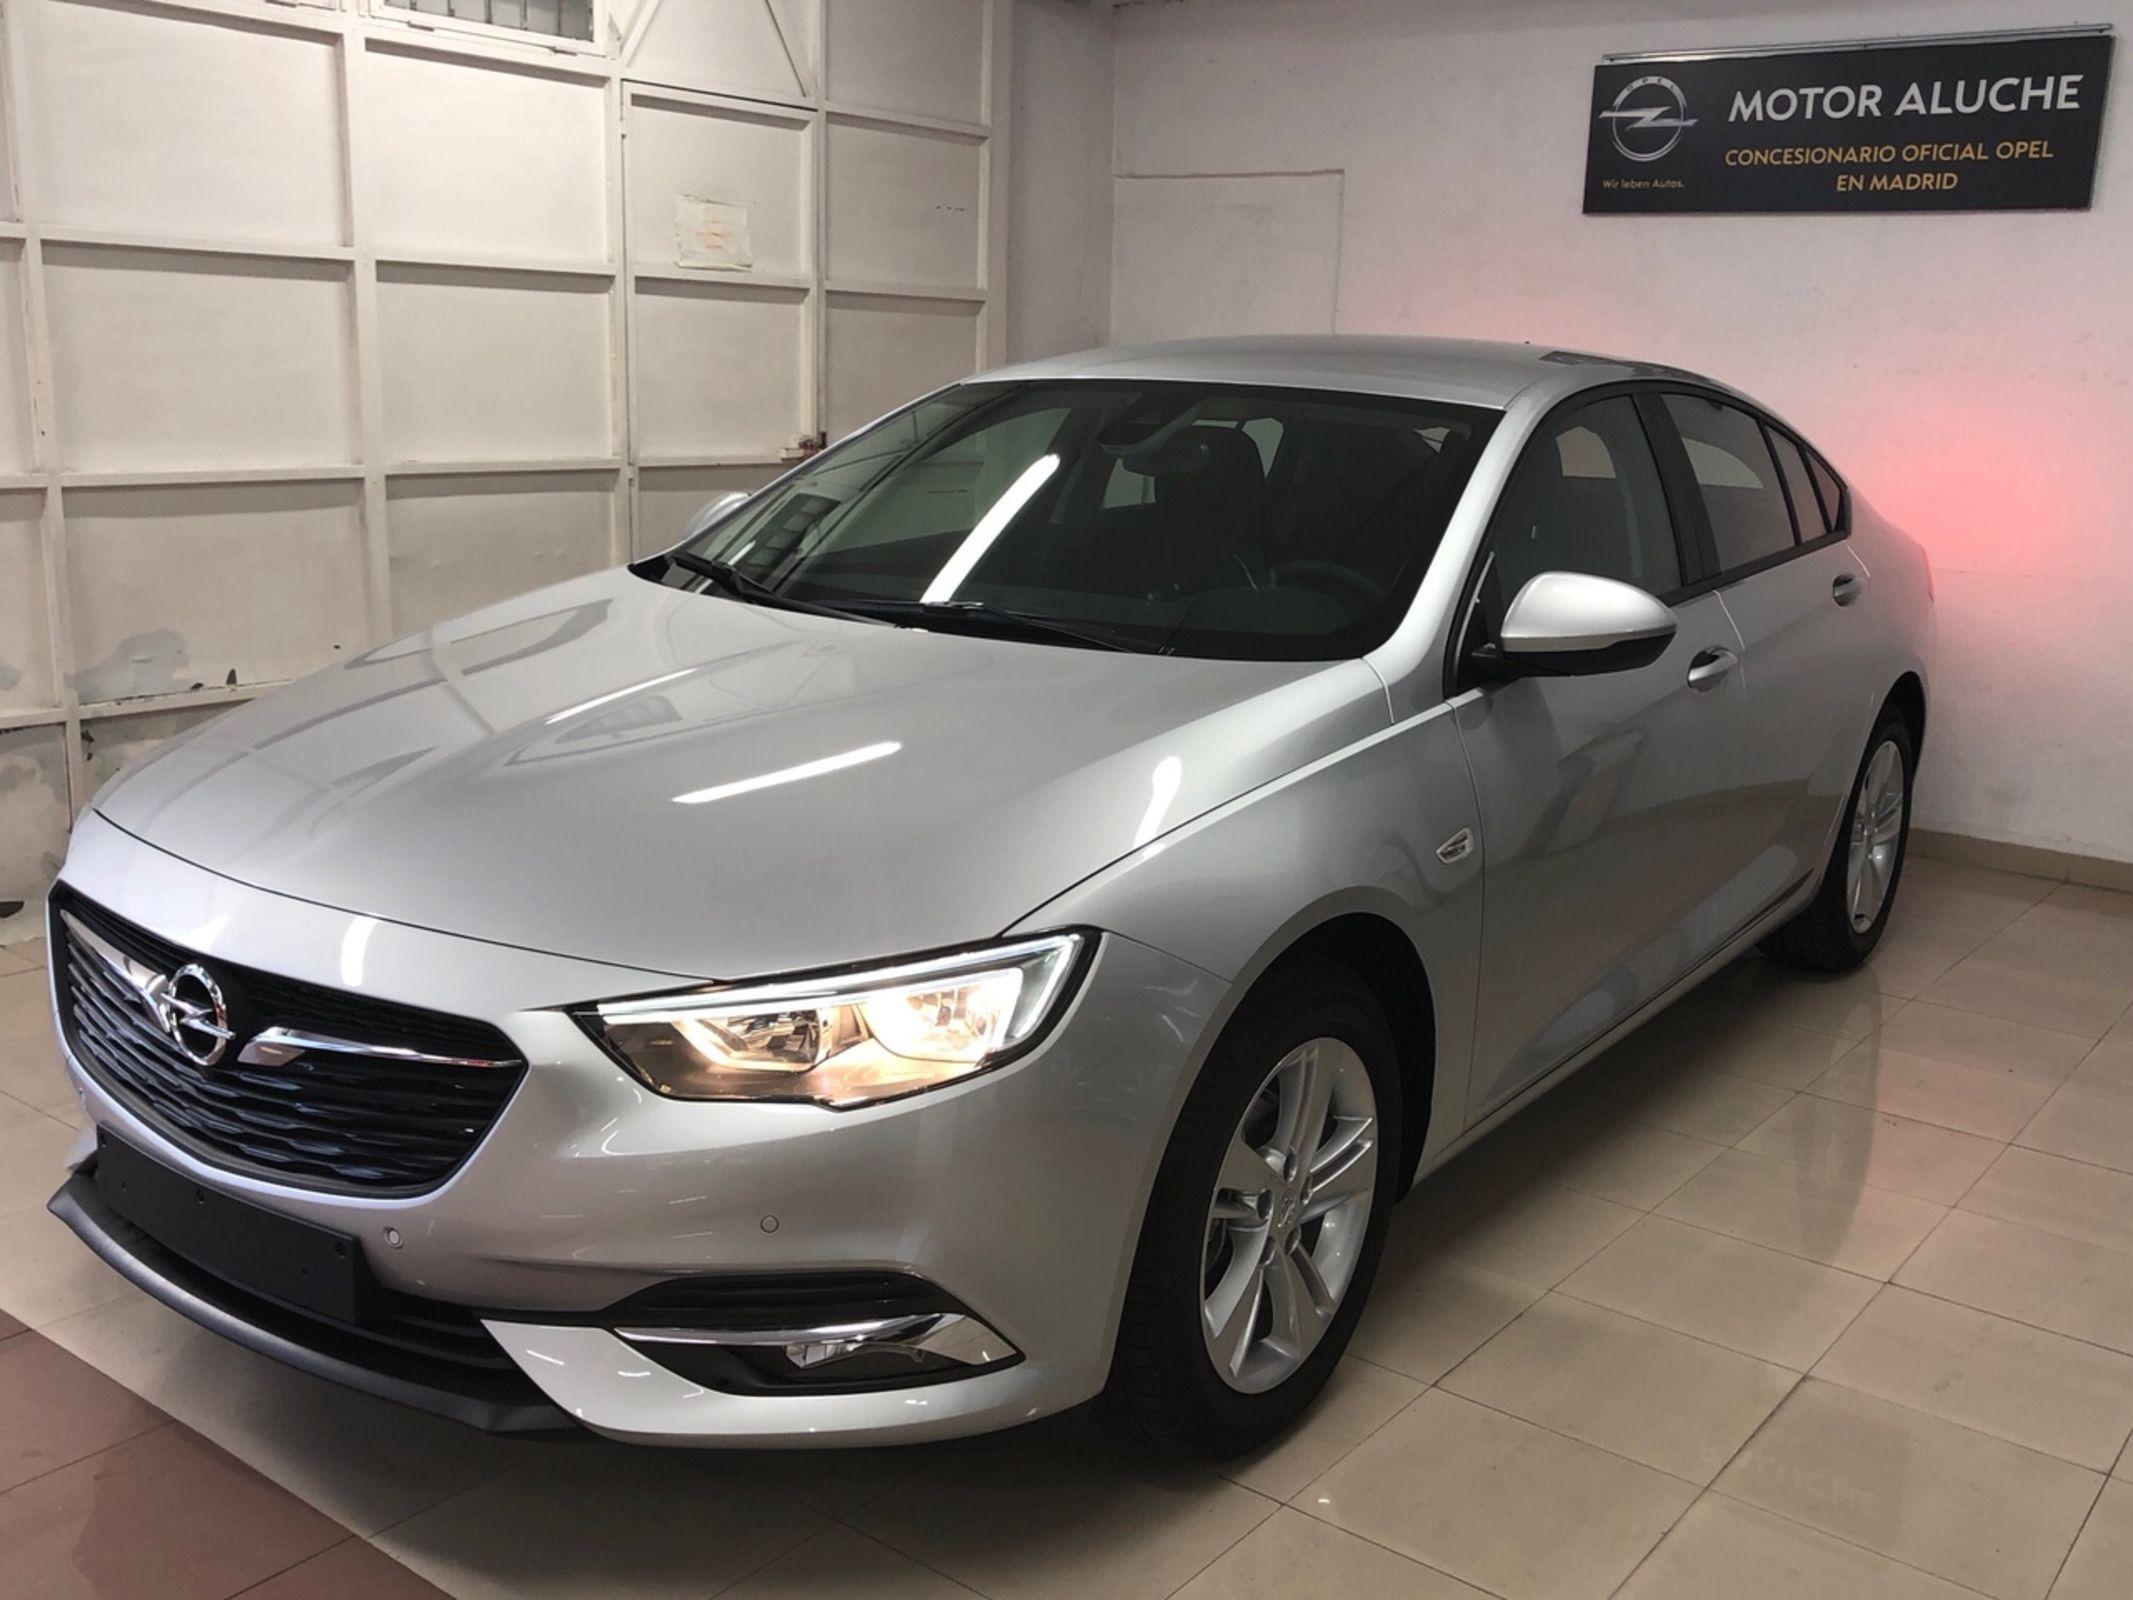 Opel Insignia GS Selective Pro 1.6 CDTI S&S TD (136CV) desde 24.990€